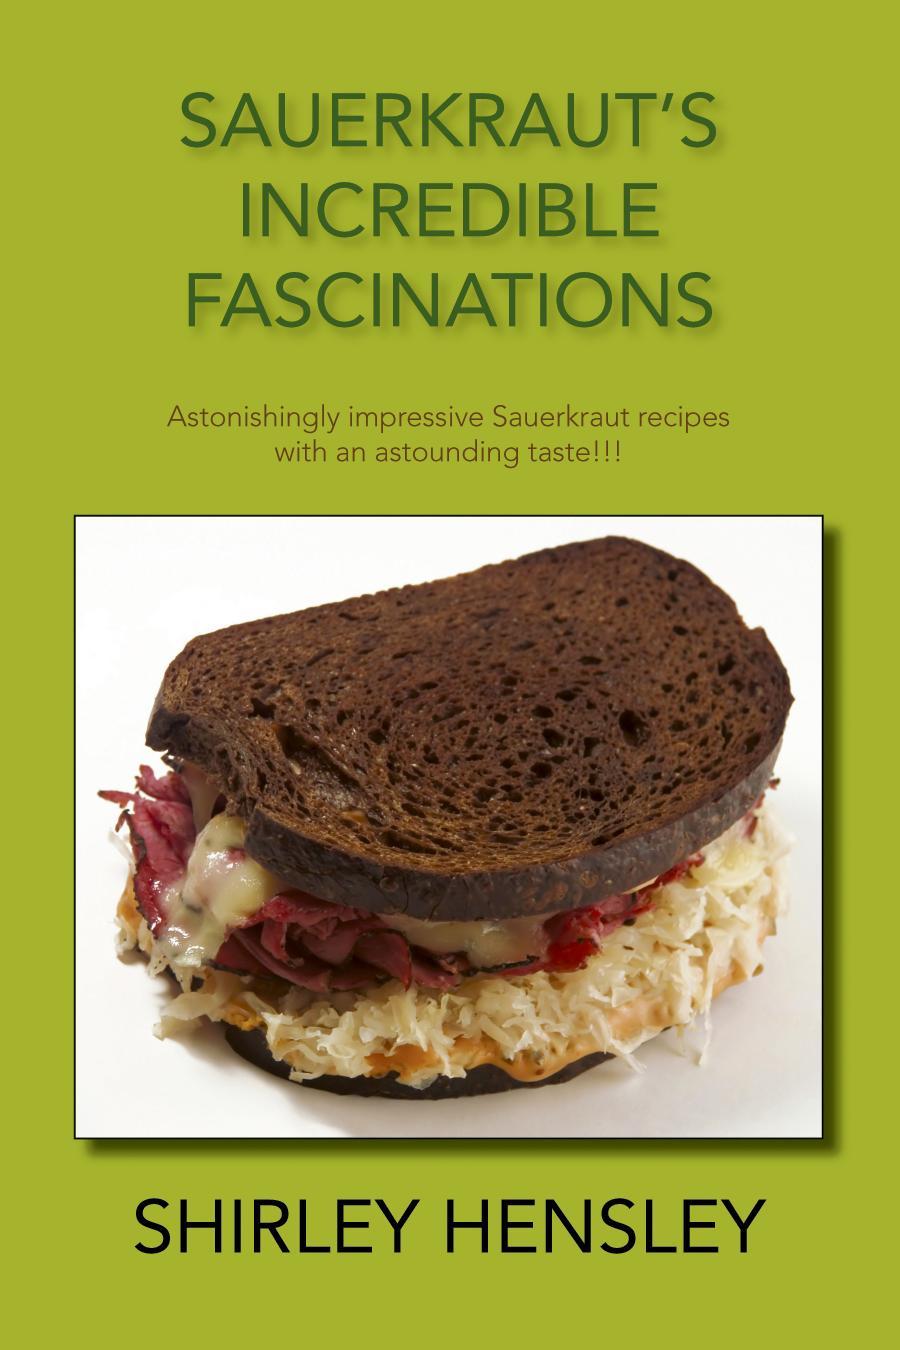 Sauerkraut's Incredible Fascinations: Astonishingly impressive Sauerkraut recipes with an astounding taste!!!